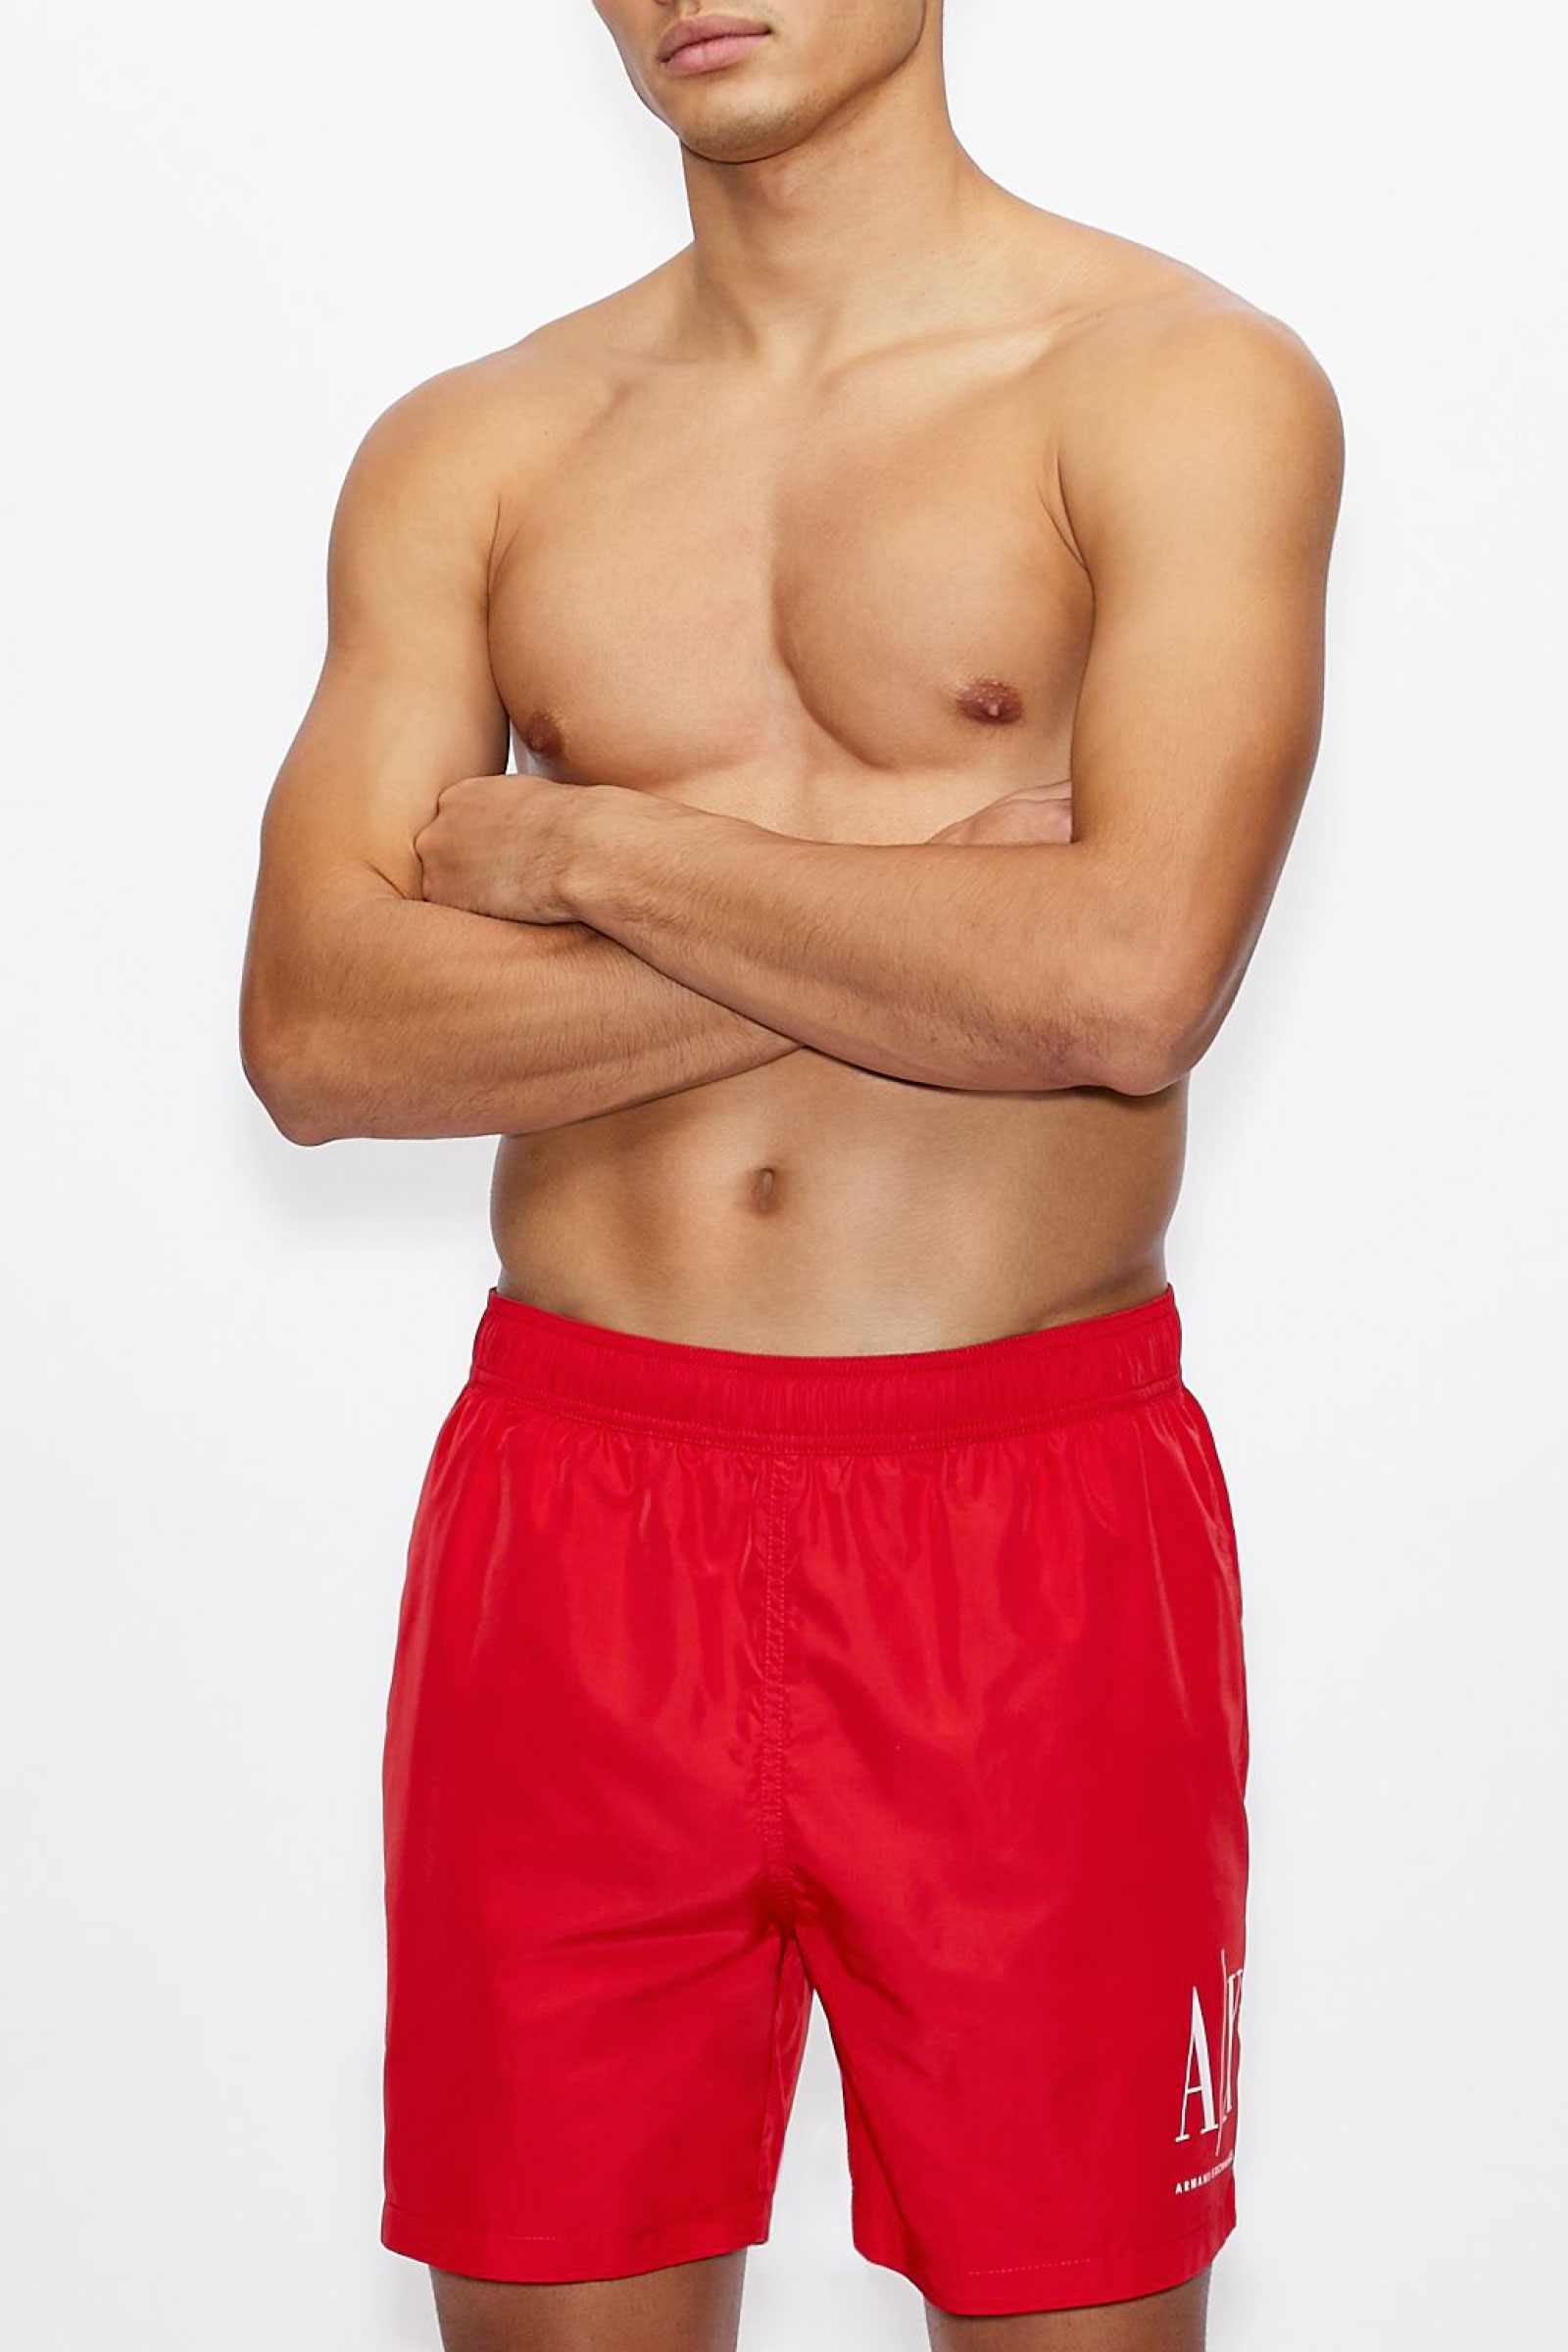 ARMANI EXCHANGE Men's Swimsuit ARMANI EXCHANGE |  | 953013 1P62300074